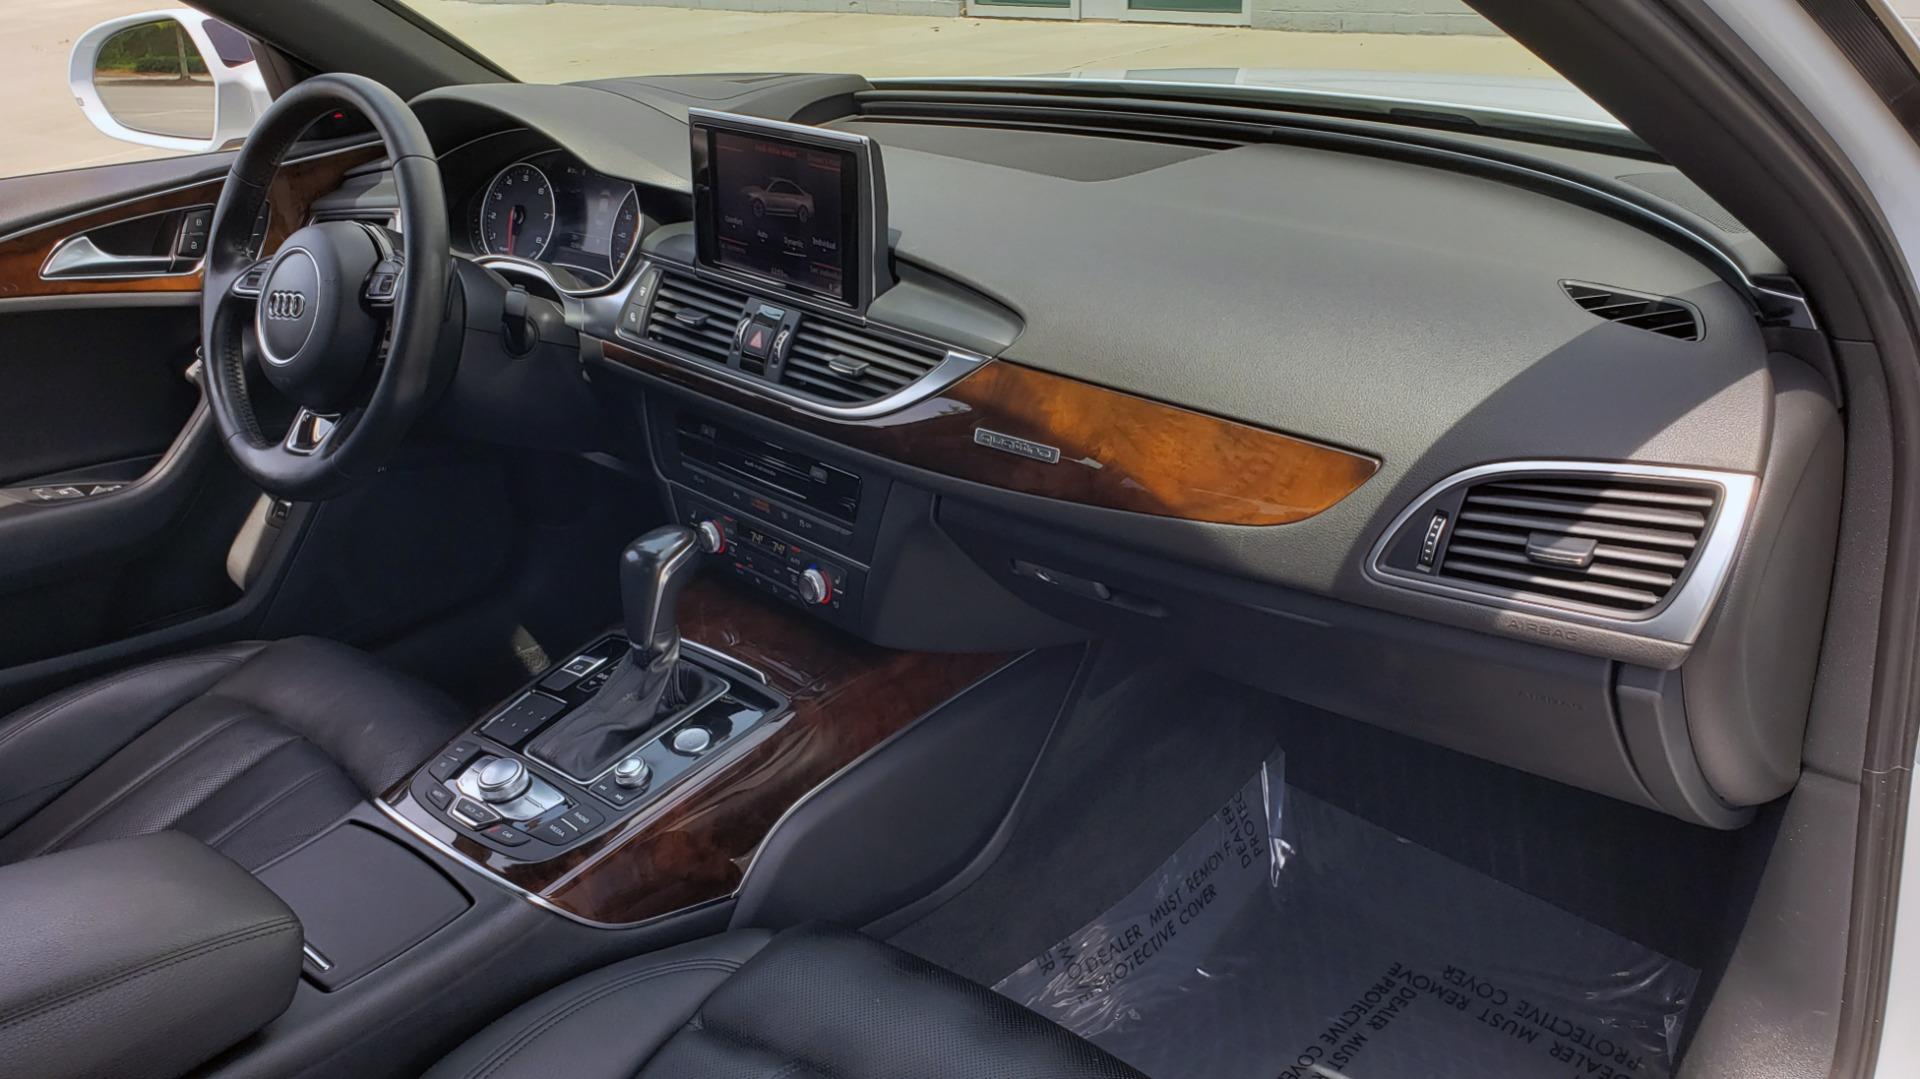 Used 2017 Audi A6 PRESTIGE SEDAN 3.0T / NAV / SUNROOF / BLACK OPTIC / CLD WTHR / REARVIEW for sale $30,797 at Formula Imports in Charlotte NC 28227 72